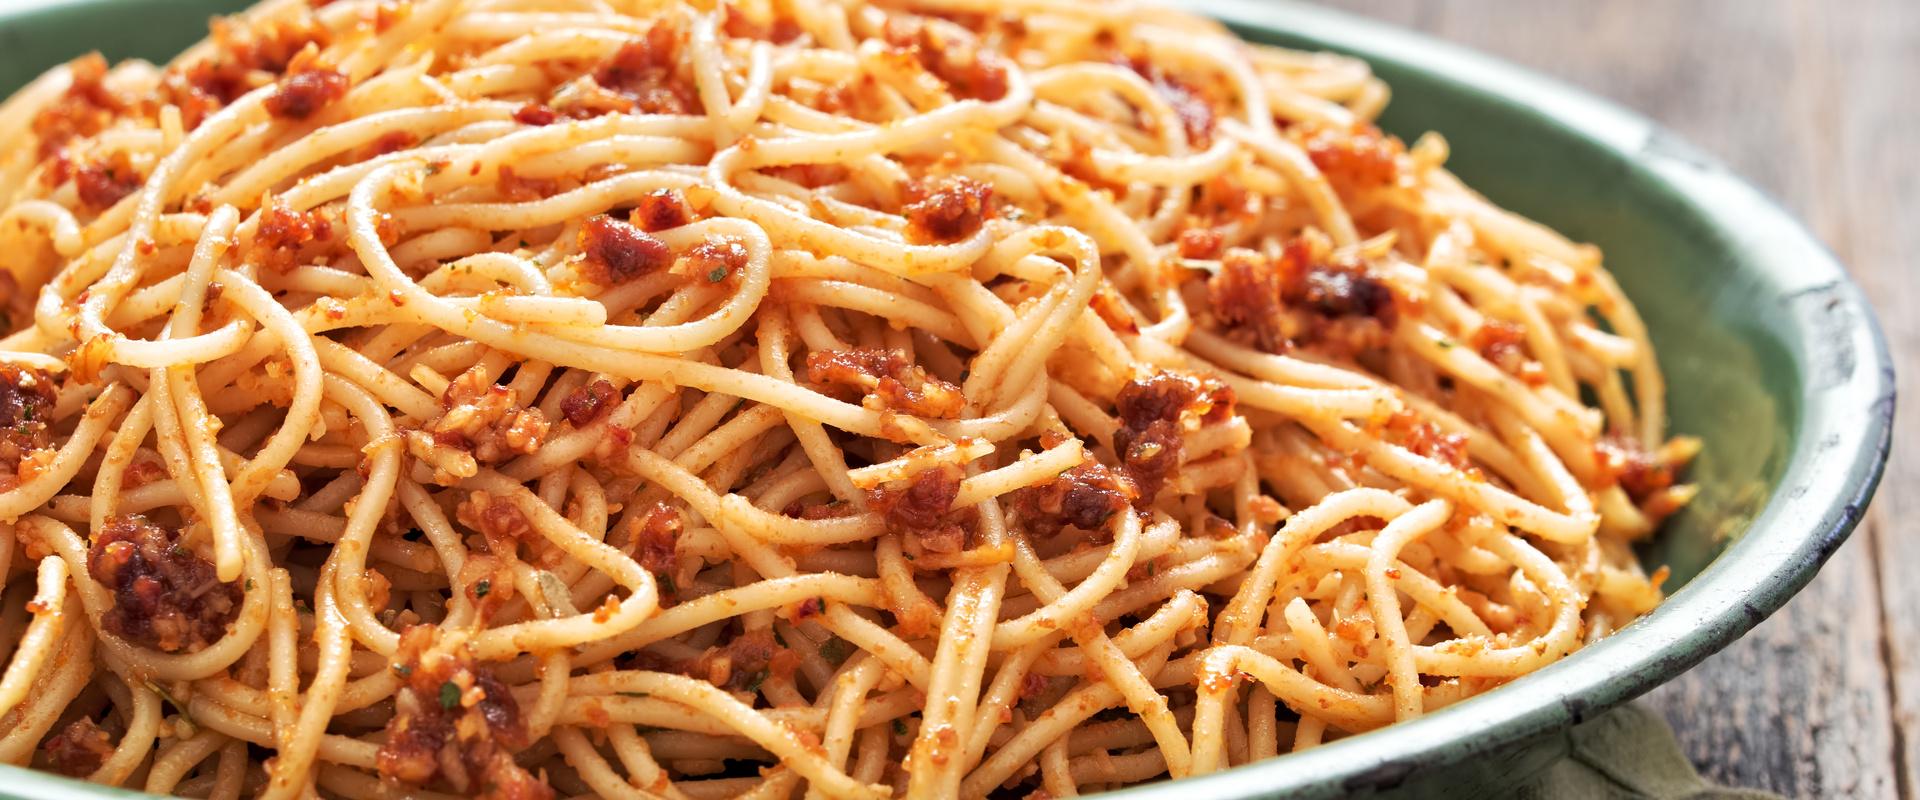 szicíliai spagetti cover